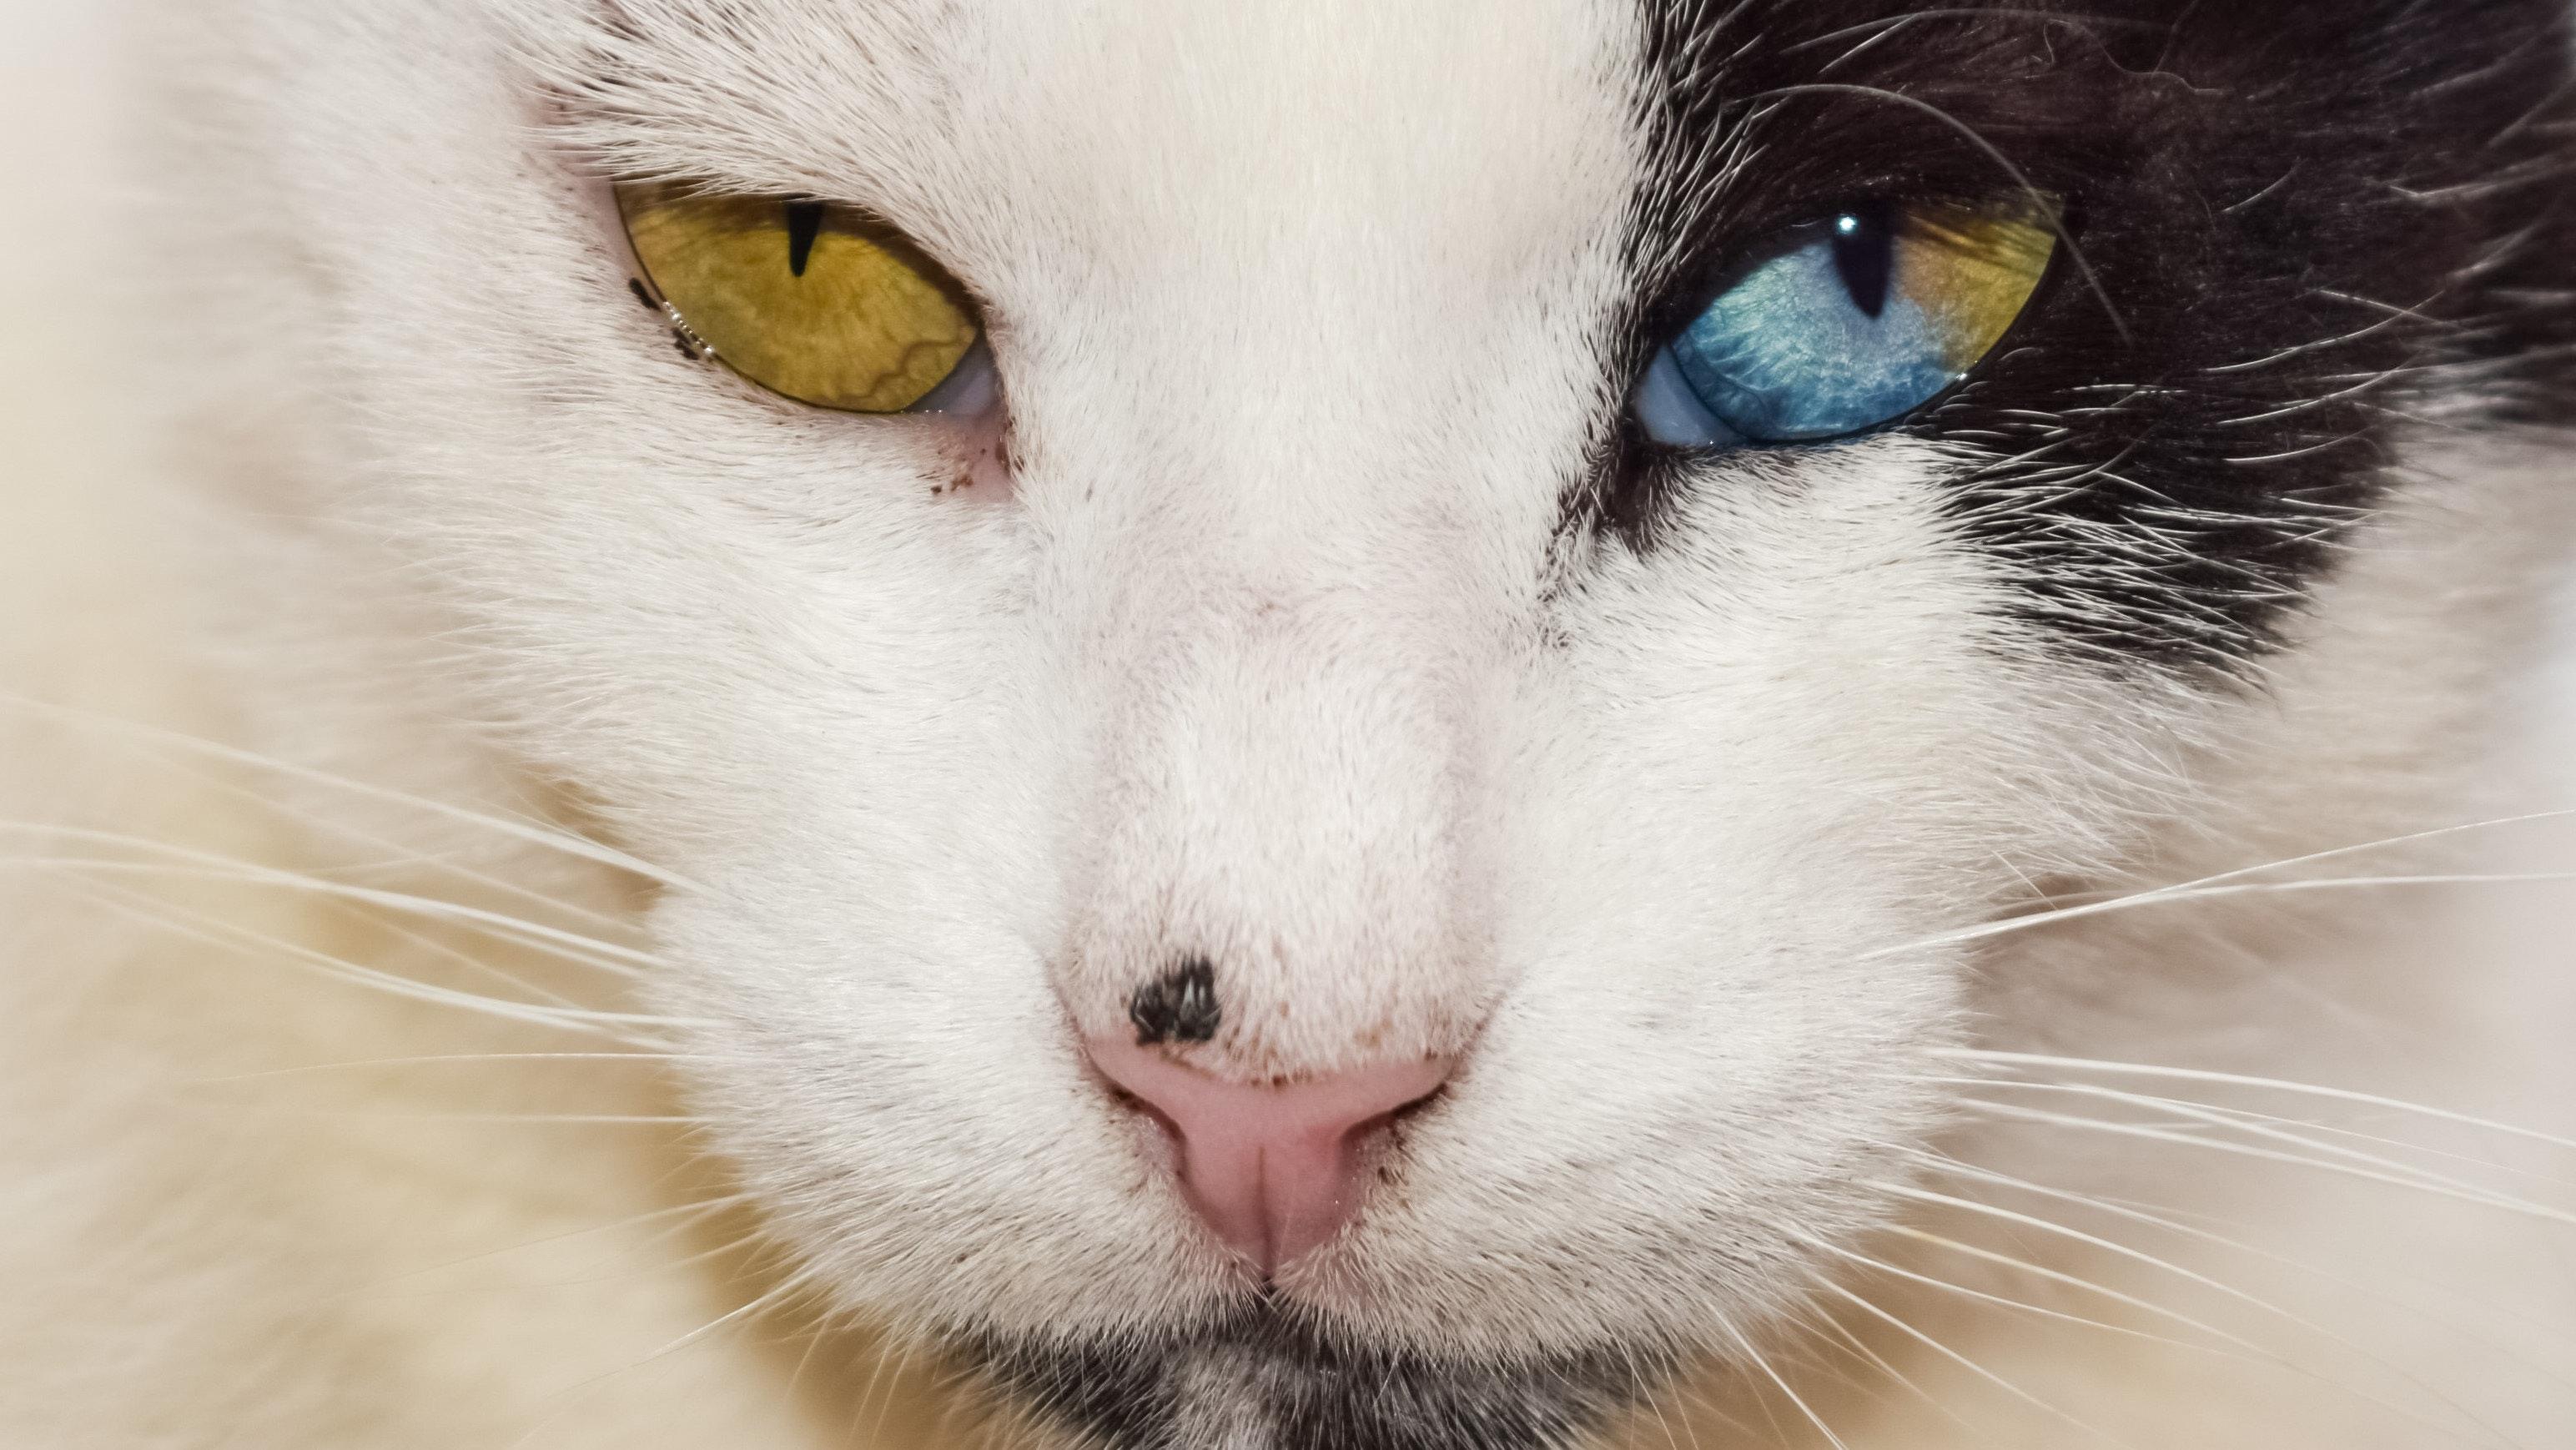 Free stock photo of animal cat eyes